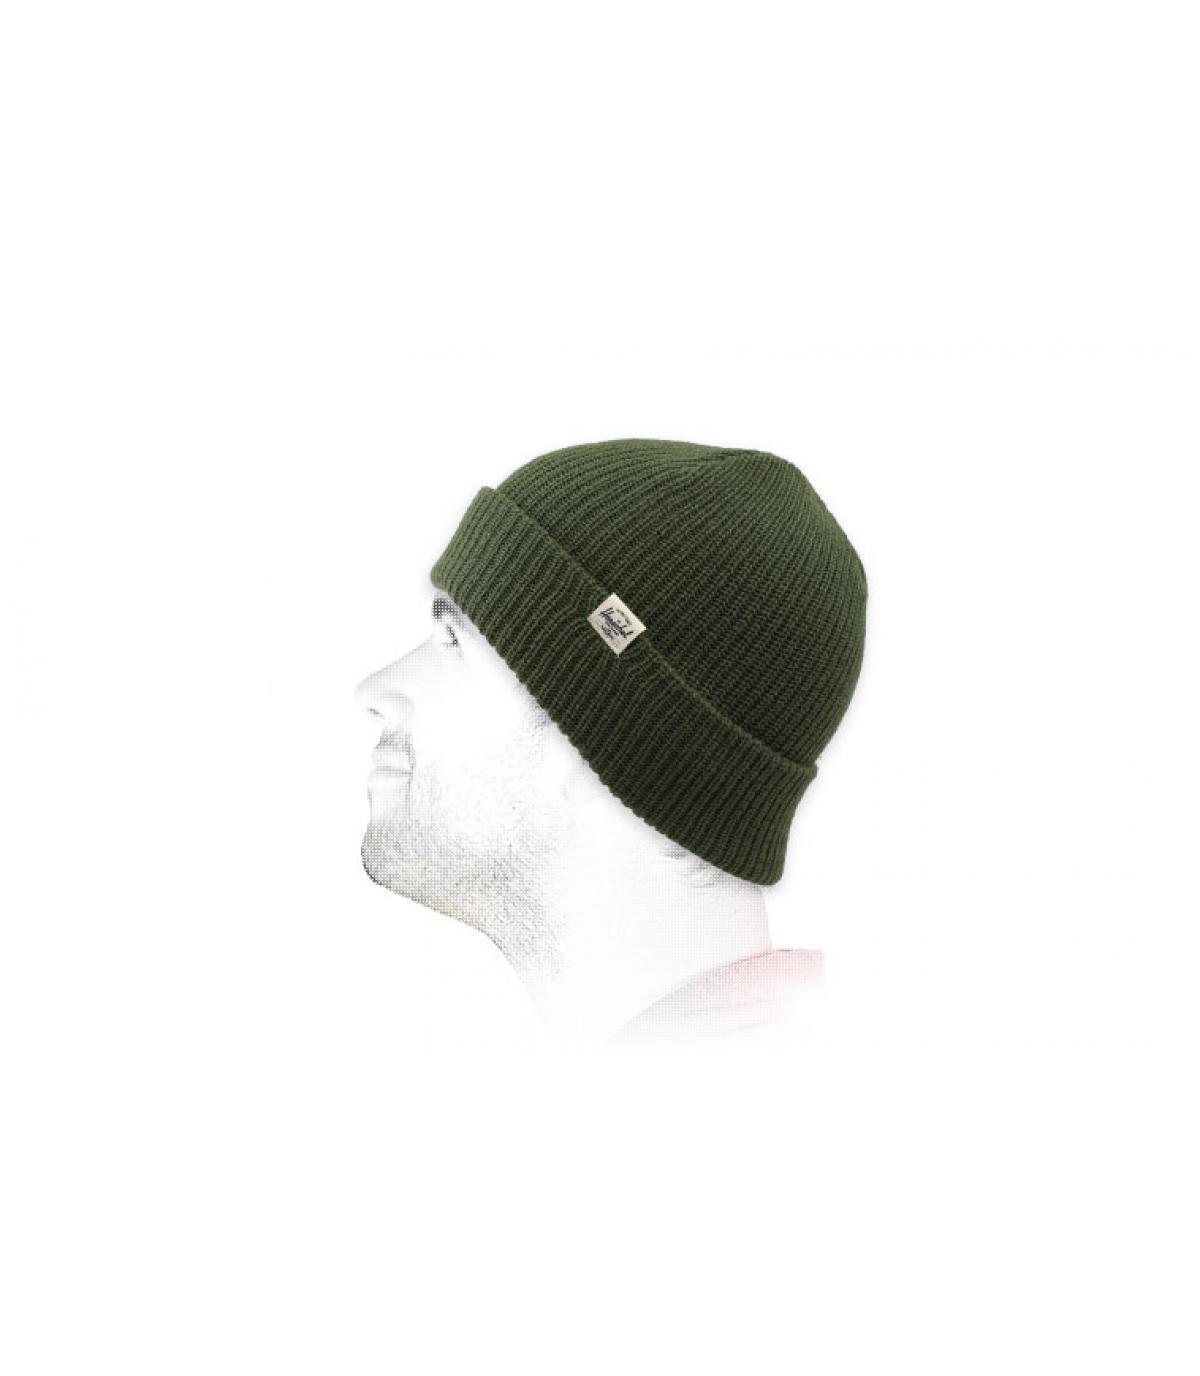 green cuffed beanie Herschel